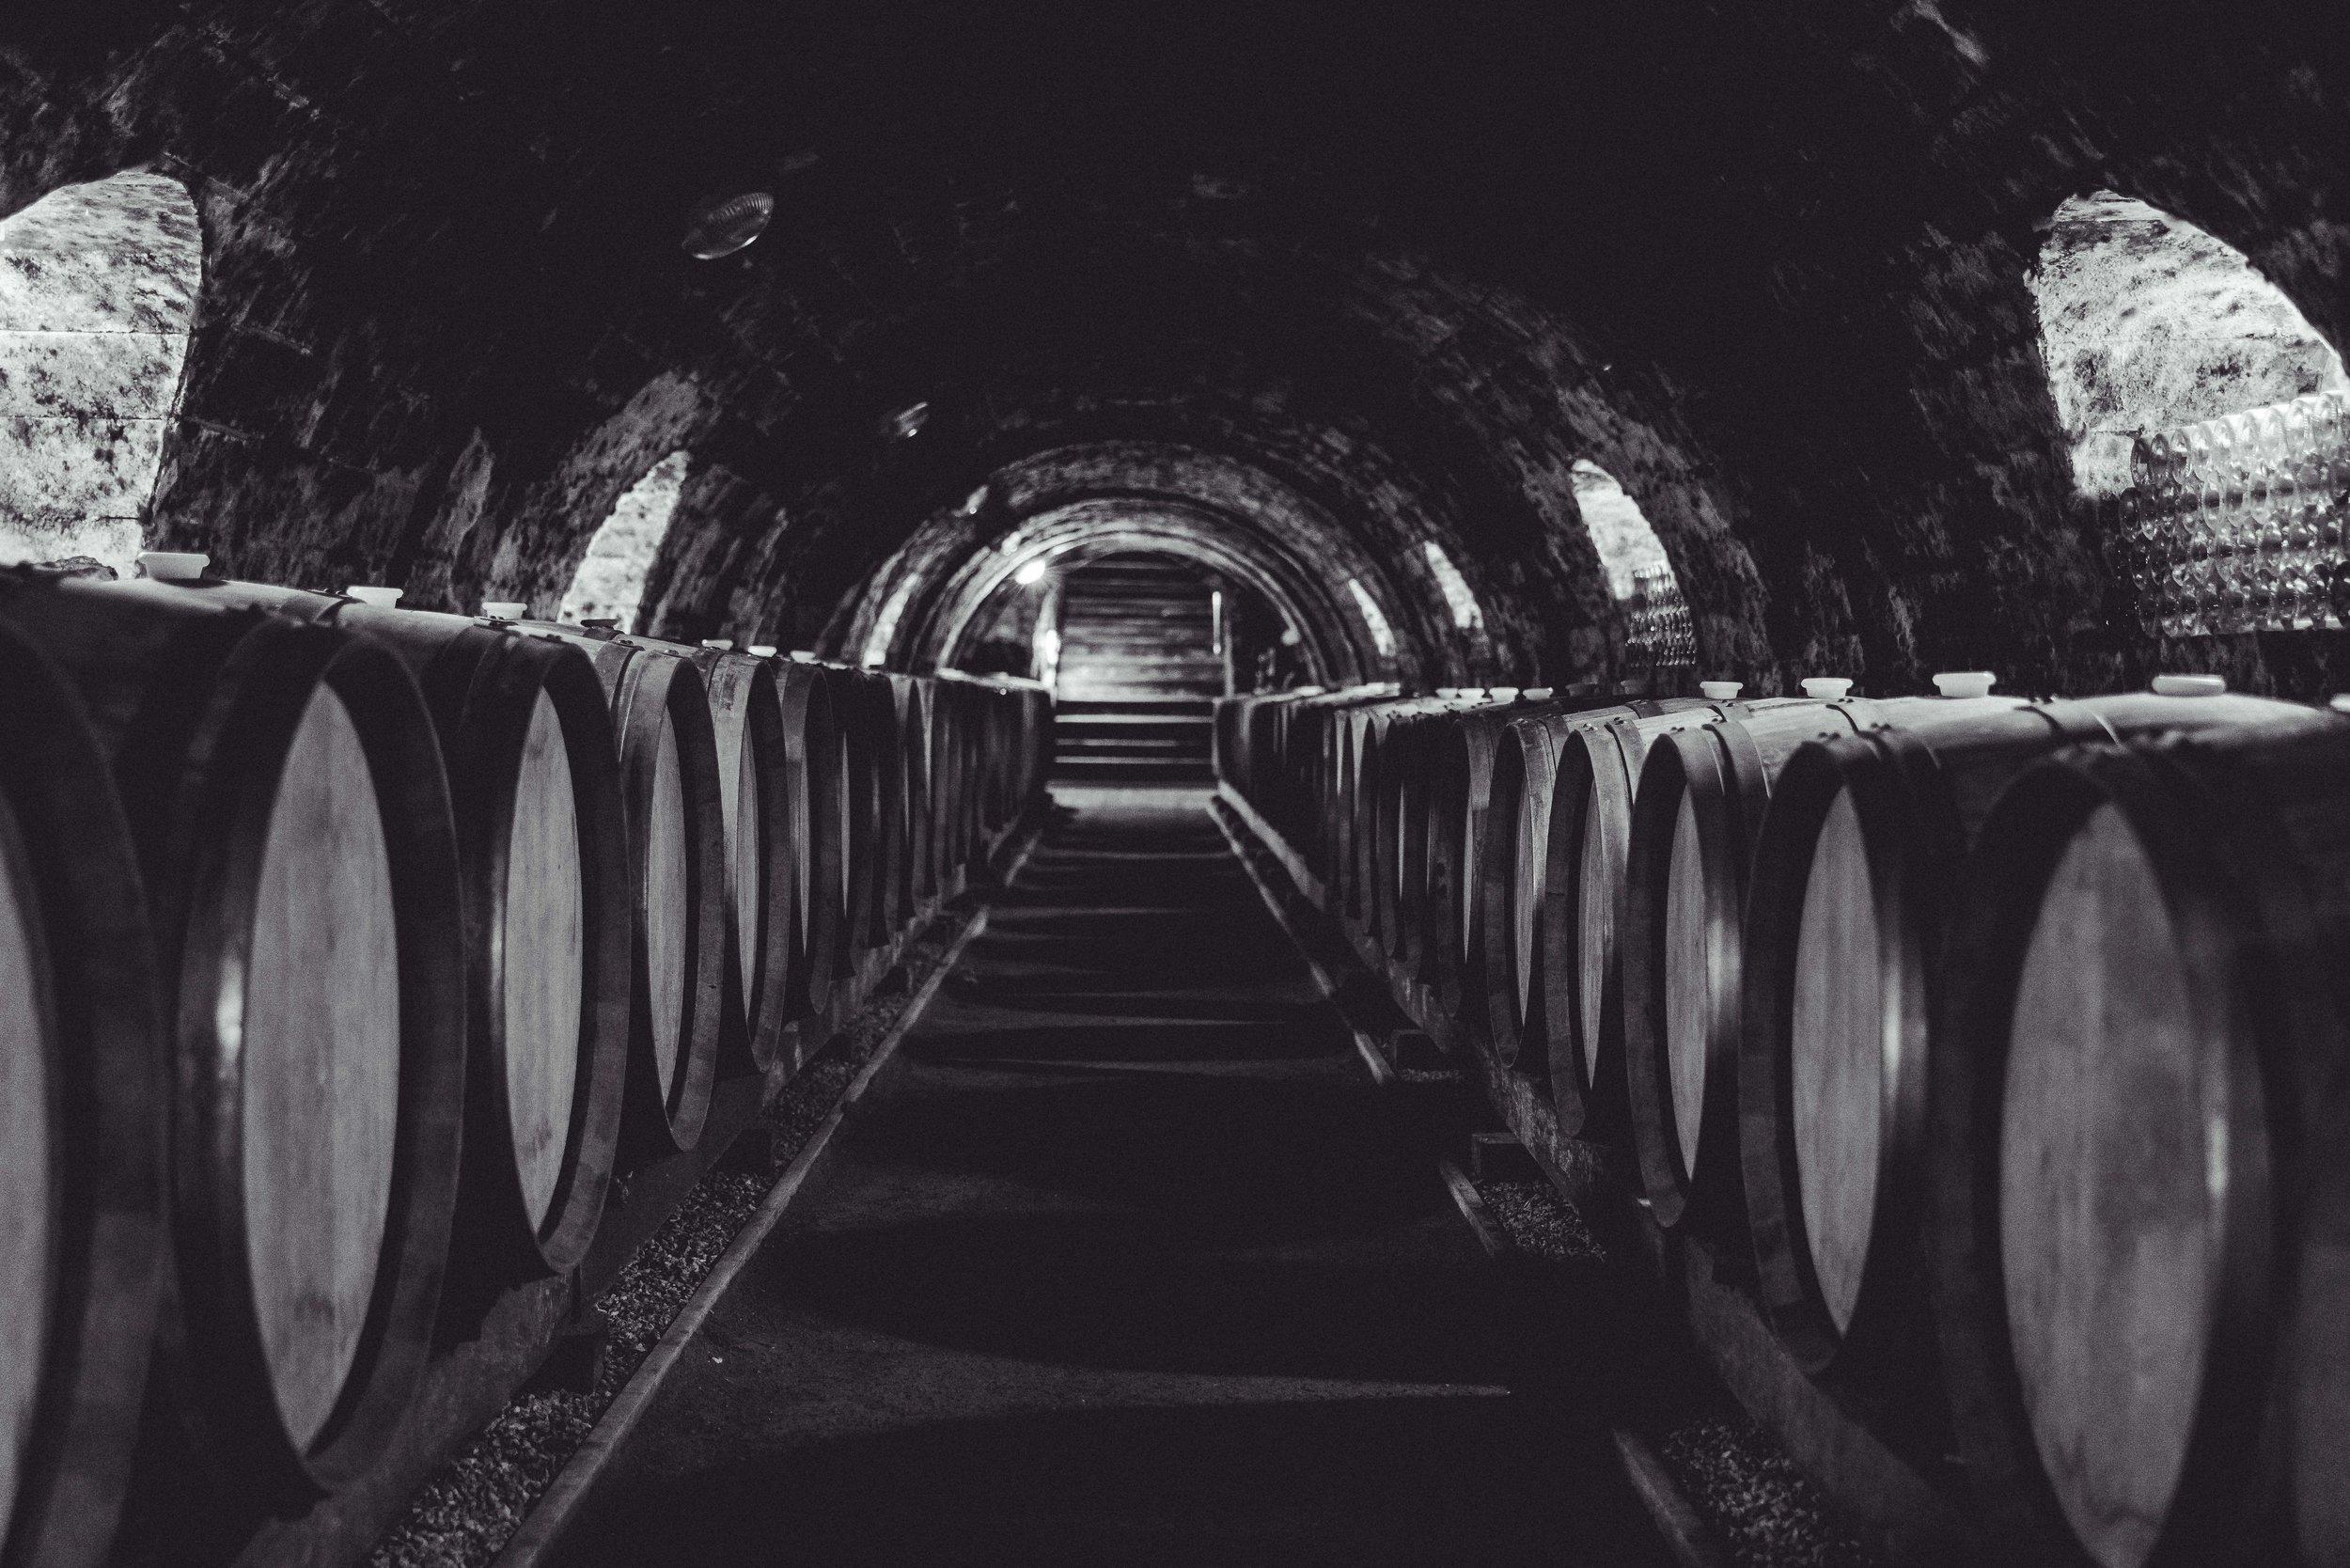 Oremus.barrels1.jpg